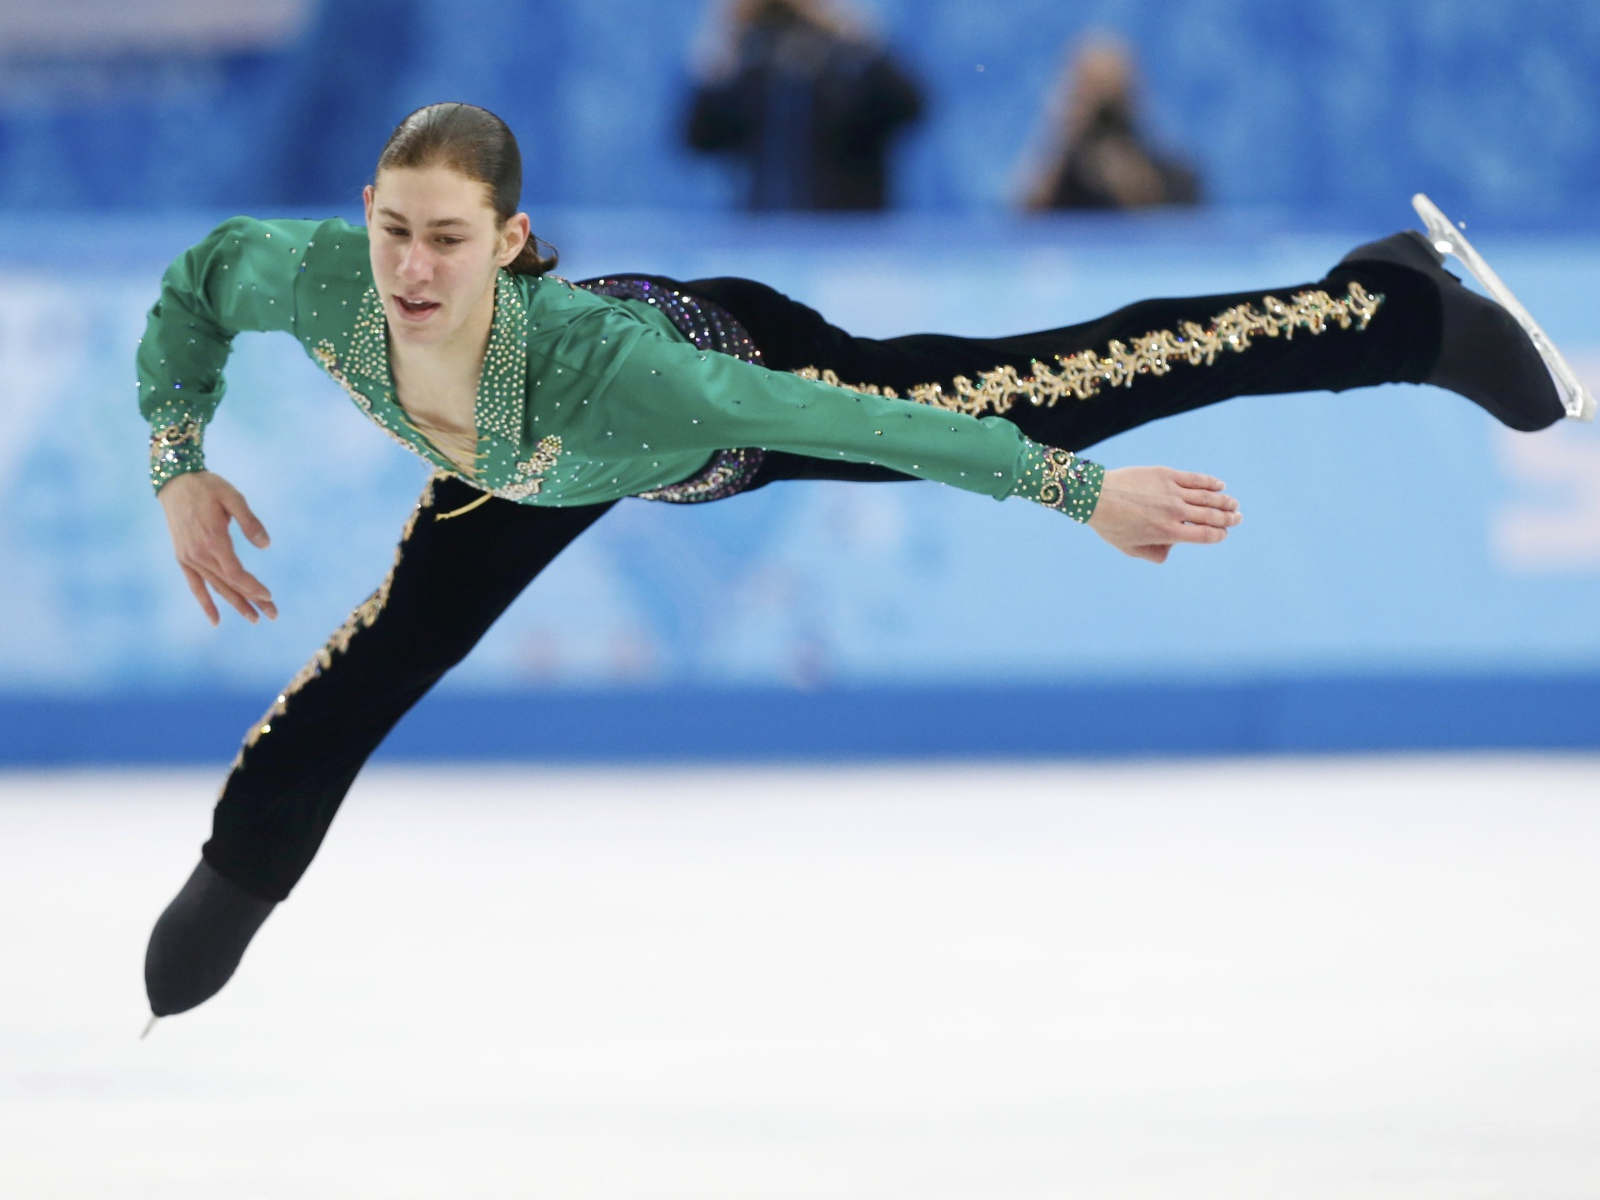 Джейсон Браун / Jason BROWN USA _Jason_Brown_American_bronze_medalist_skater_069454_2